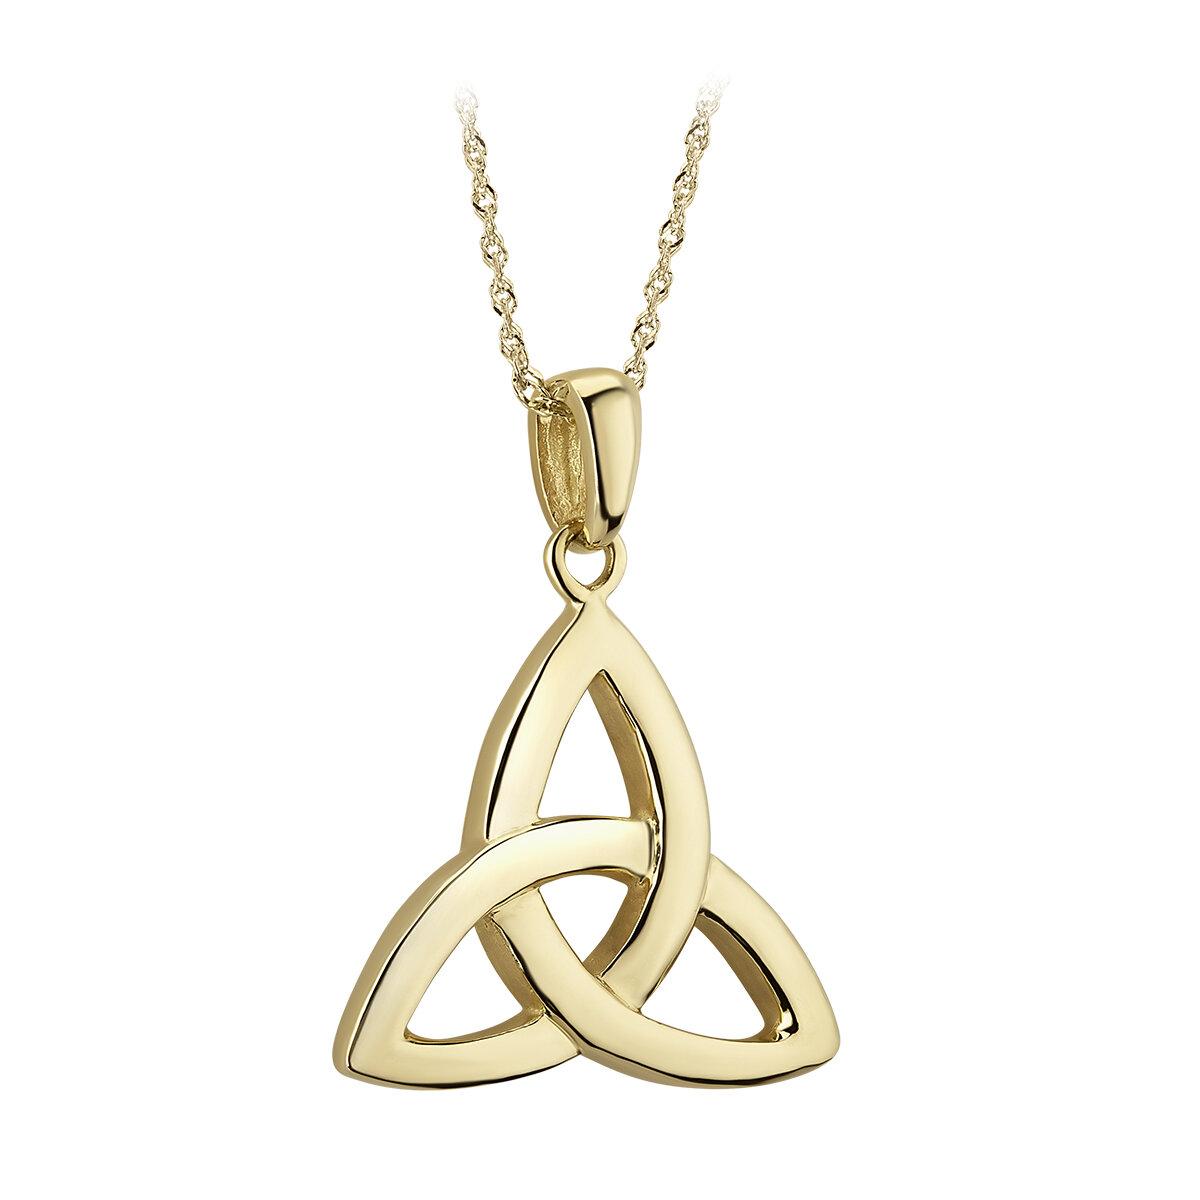 14k gold large trinity knot pendant s44176 from Solvar